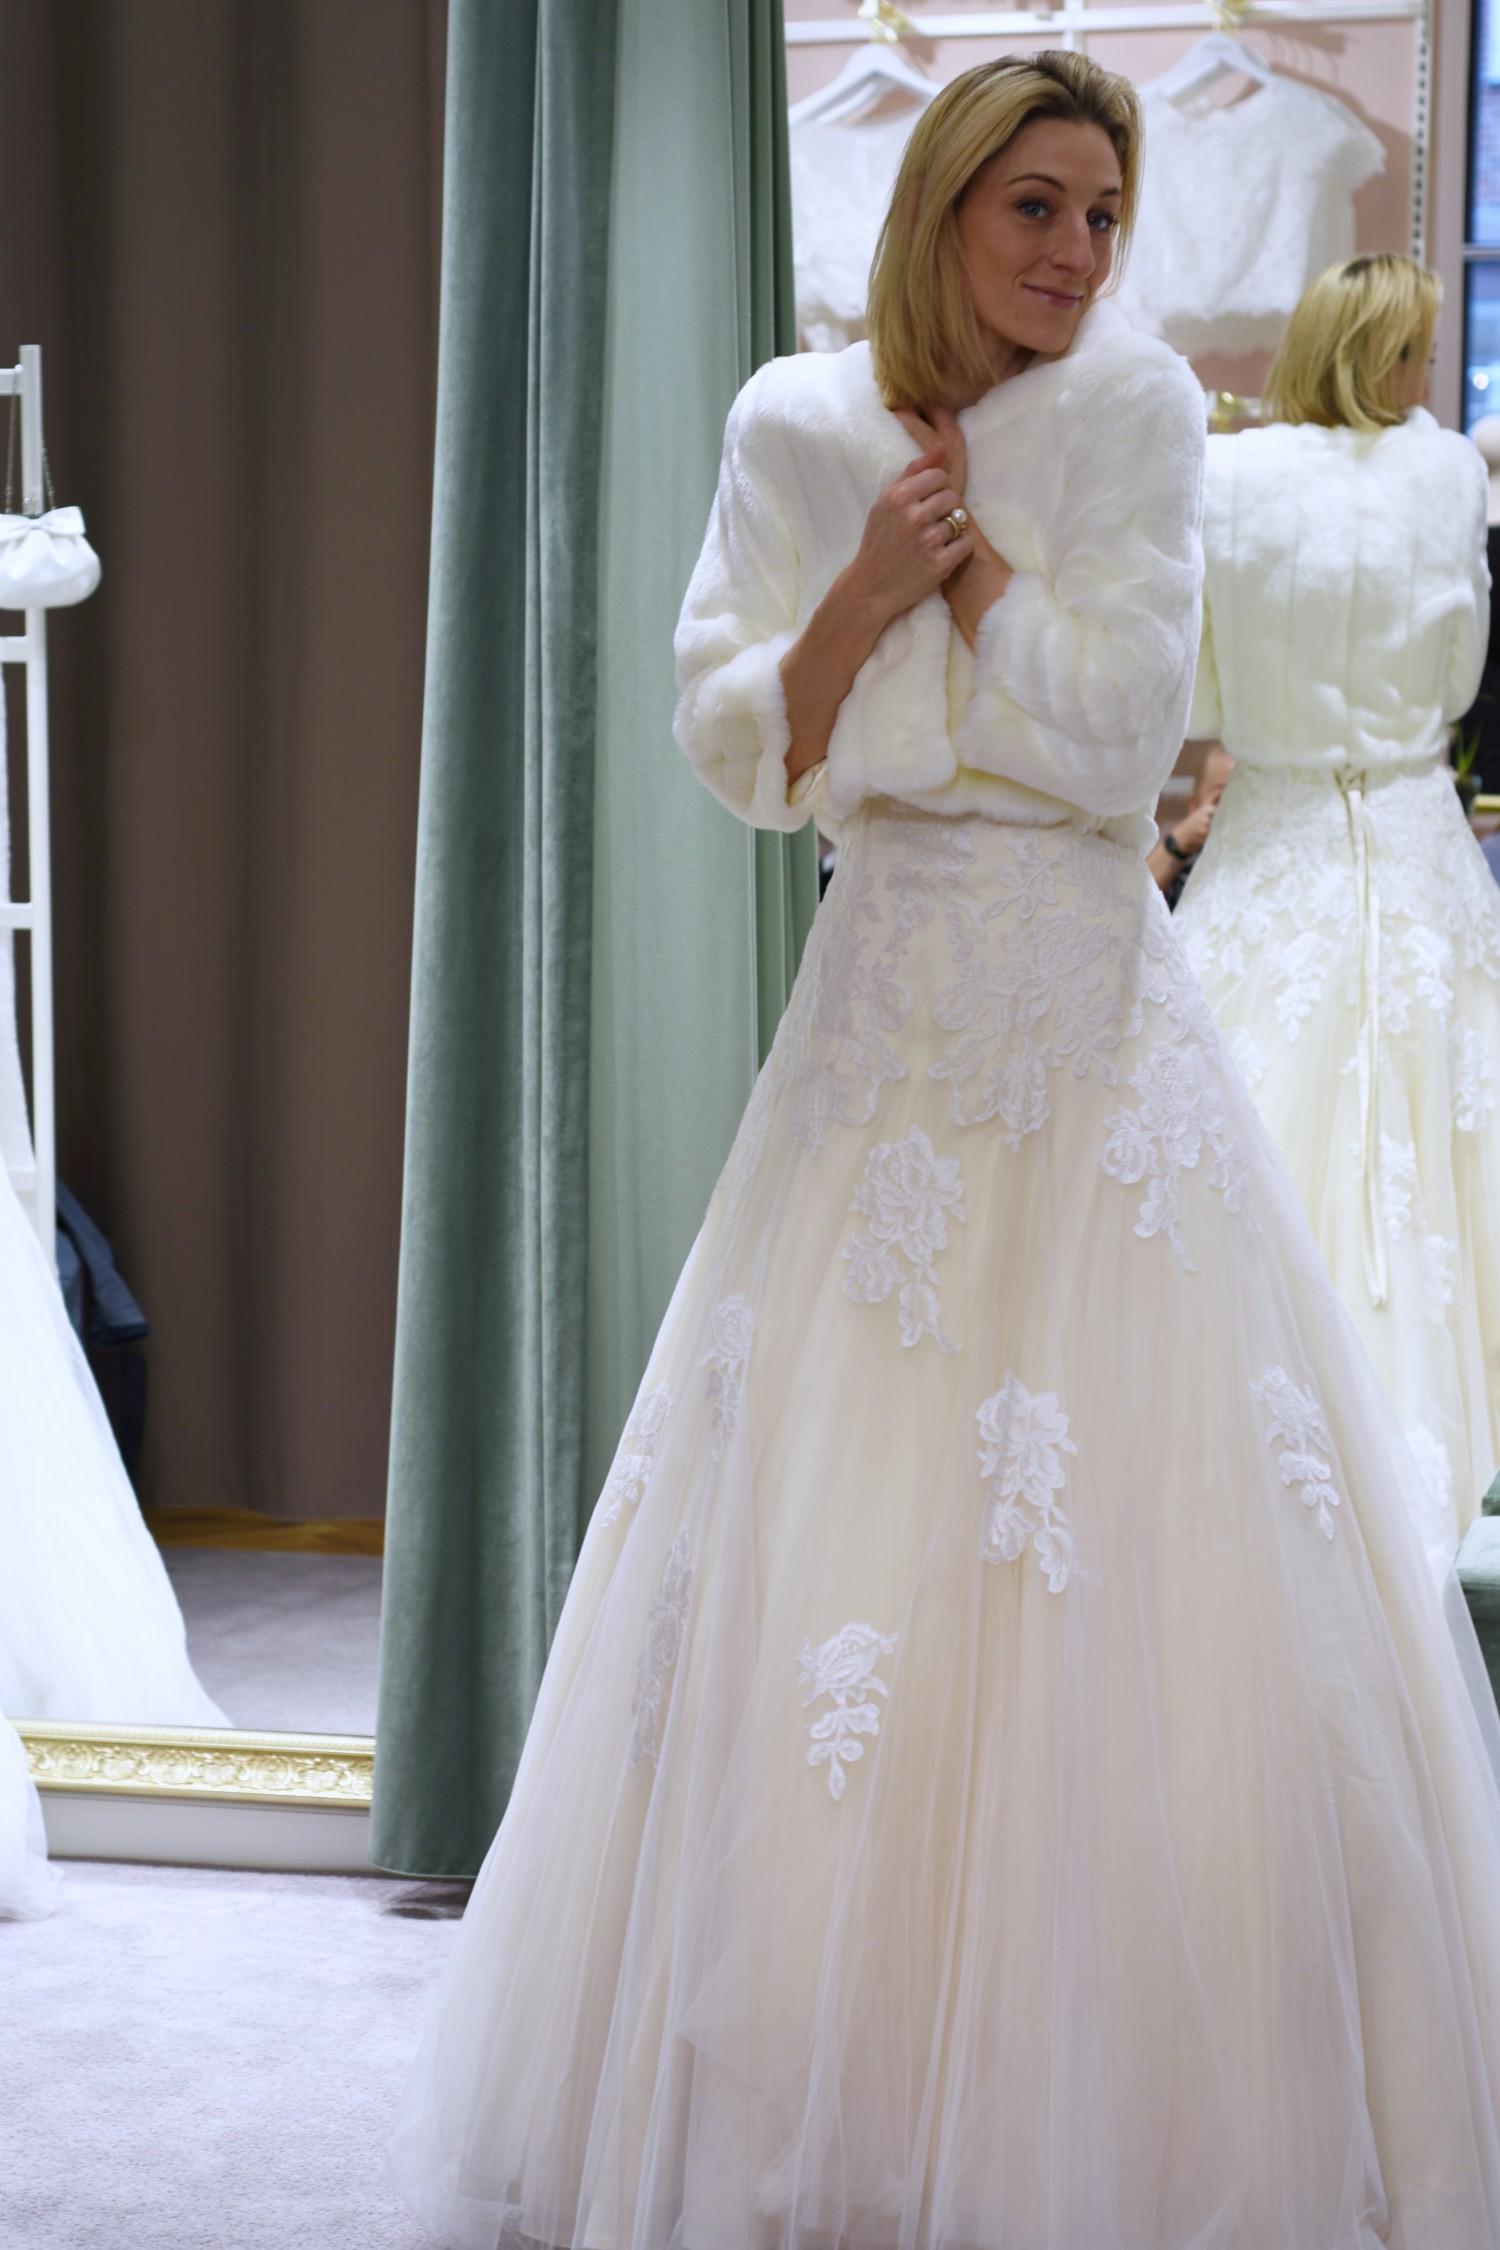 lilly-brudekjoler-annemette-voss-39